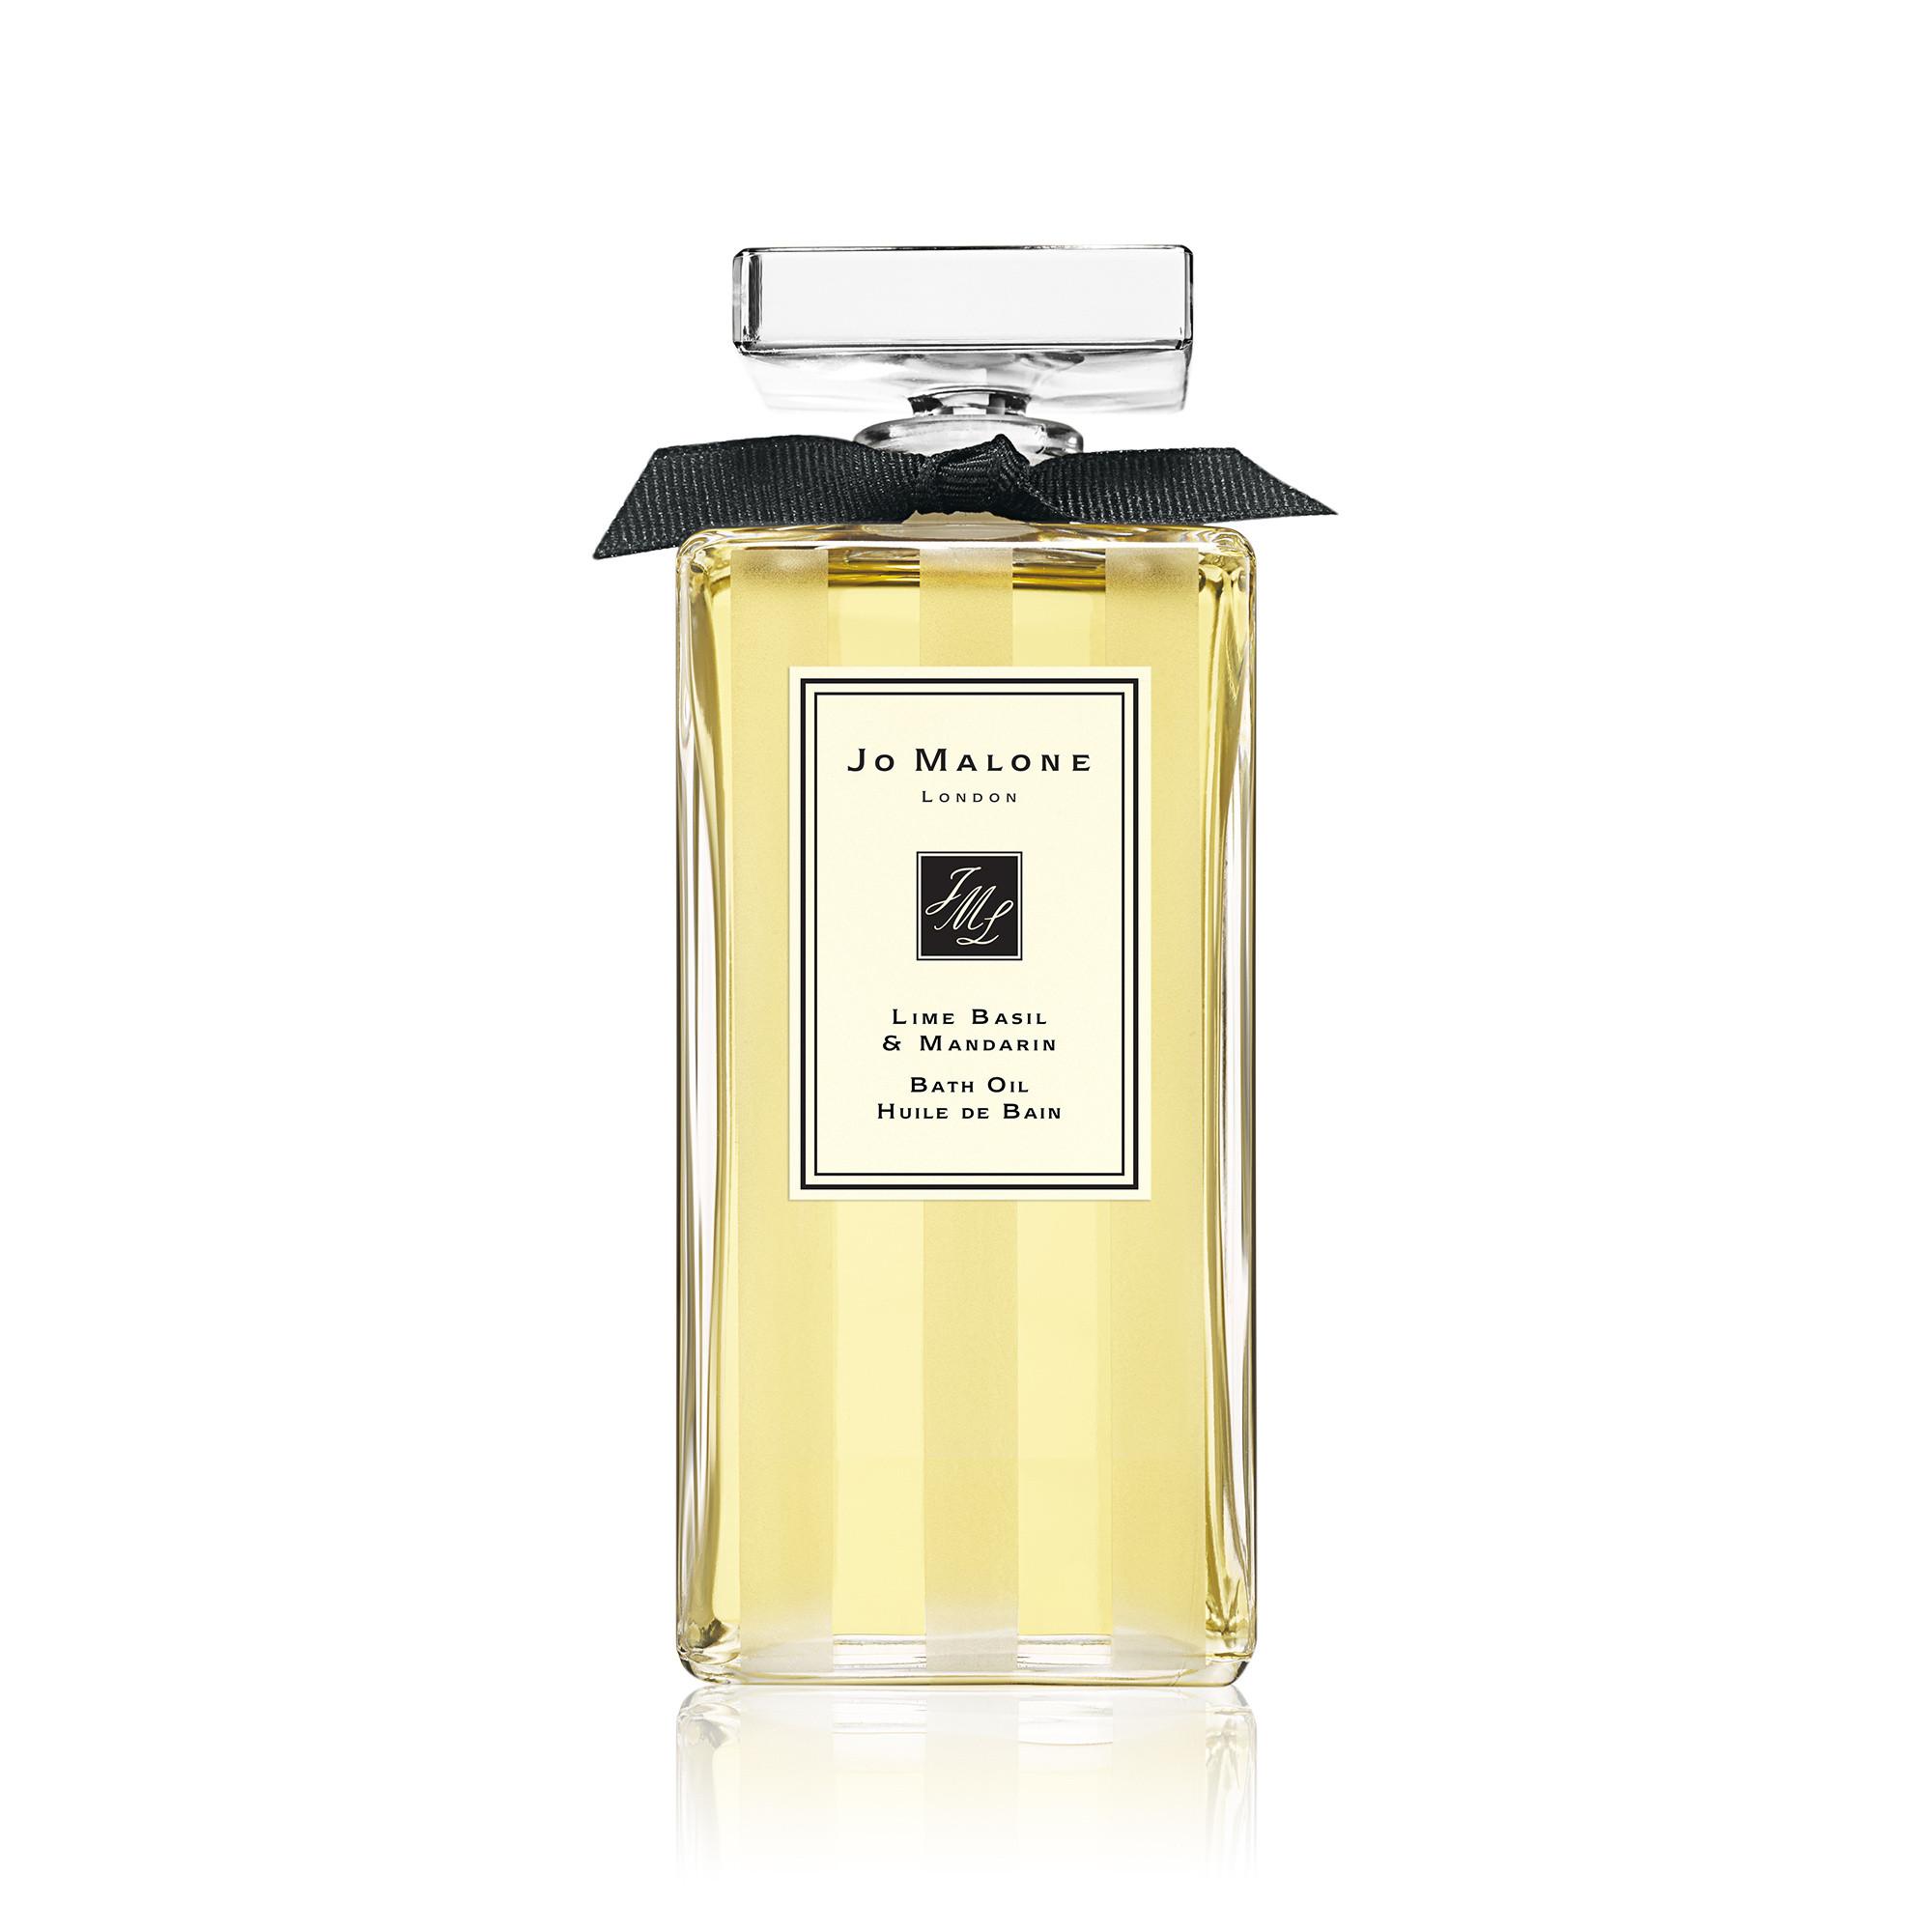 Jo Malone London lime basil & mandarin bath oil 200 ml, Beige, large image number 0